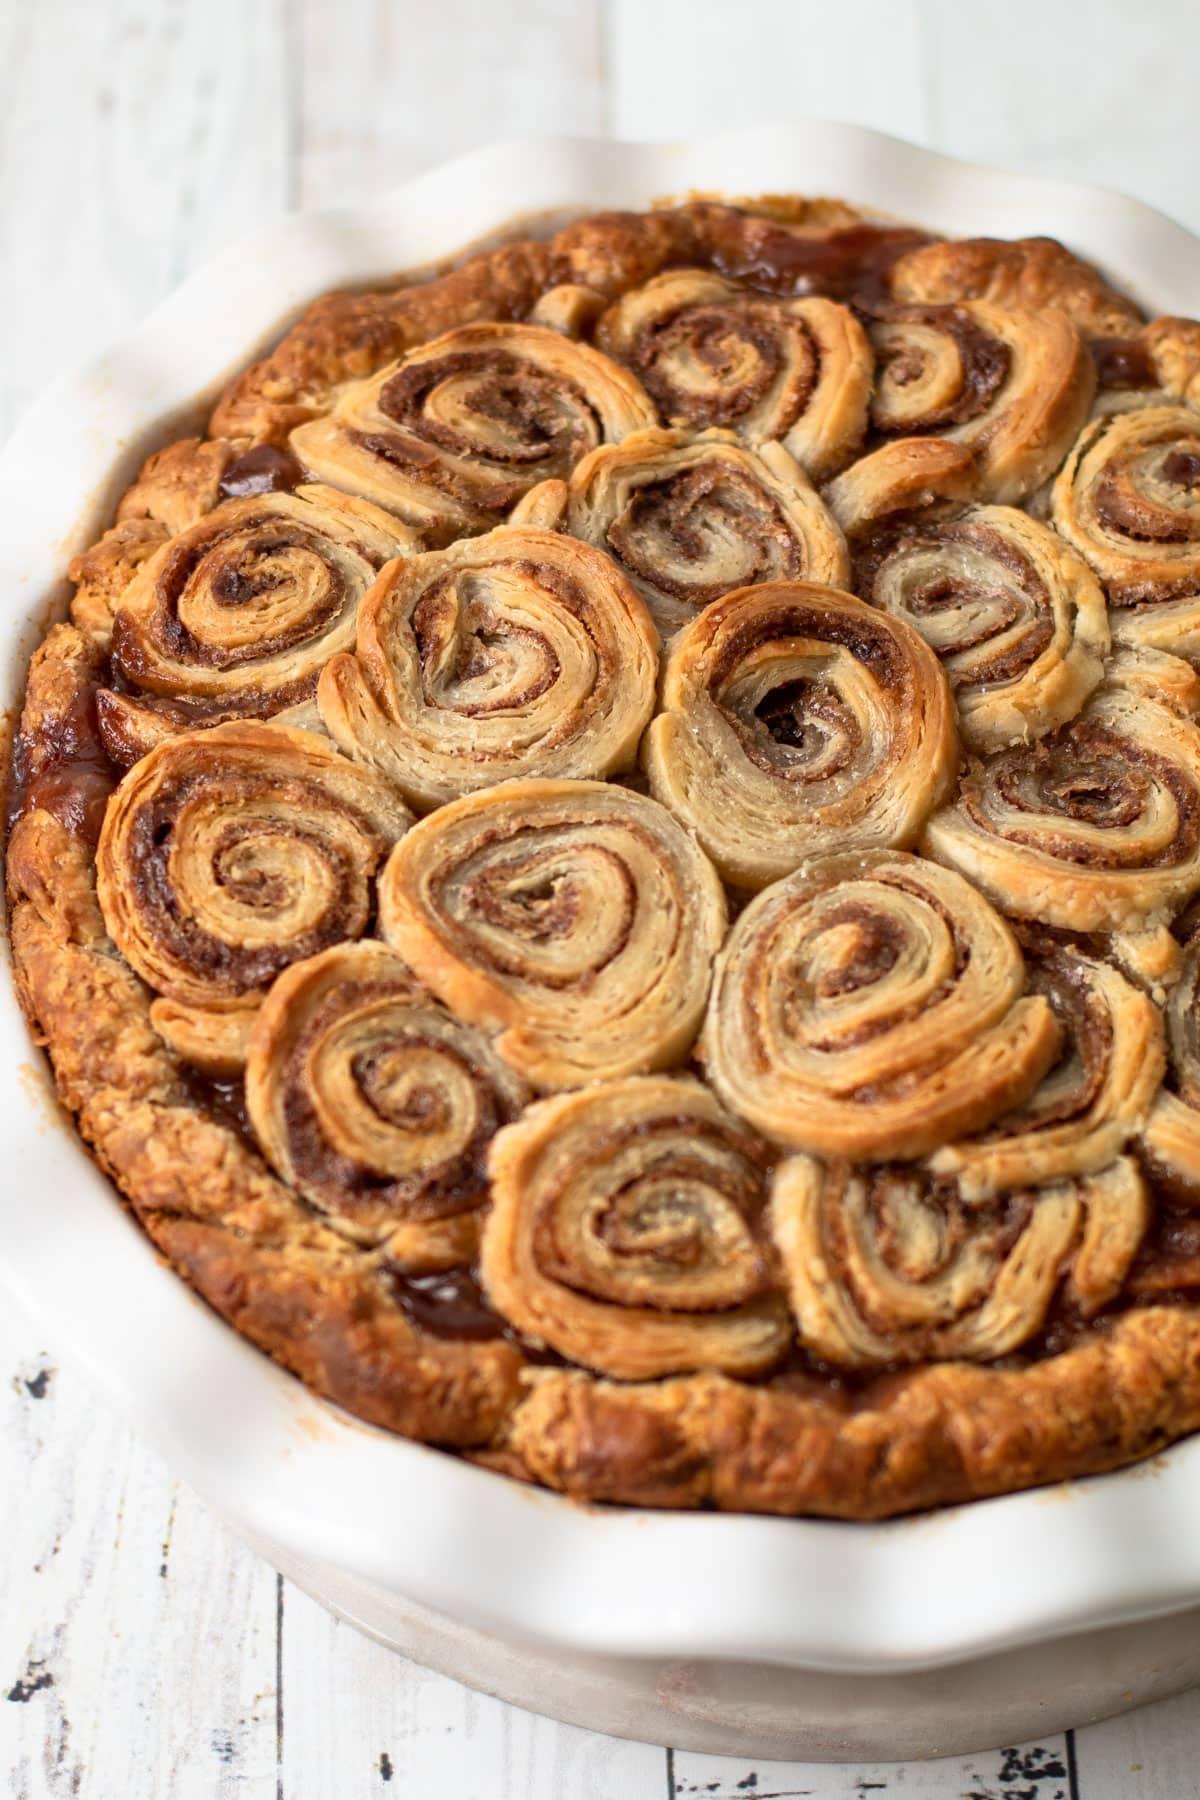 A fully baked cinnamon roll apple pie